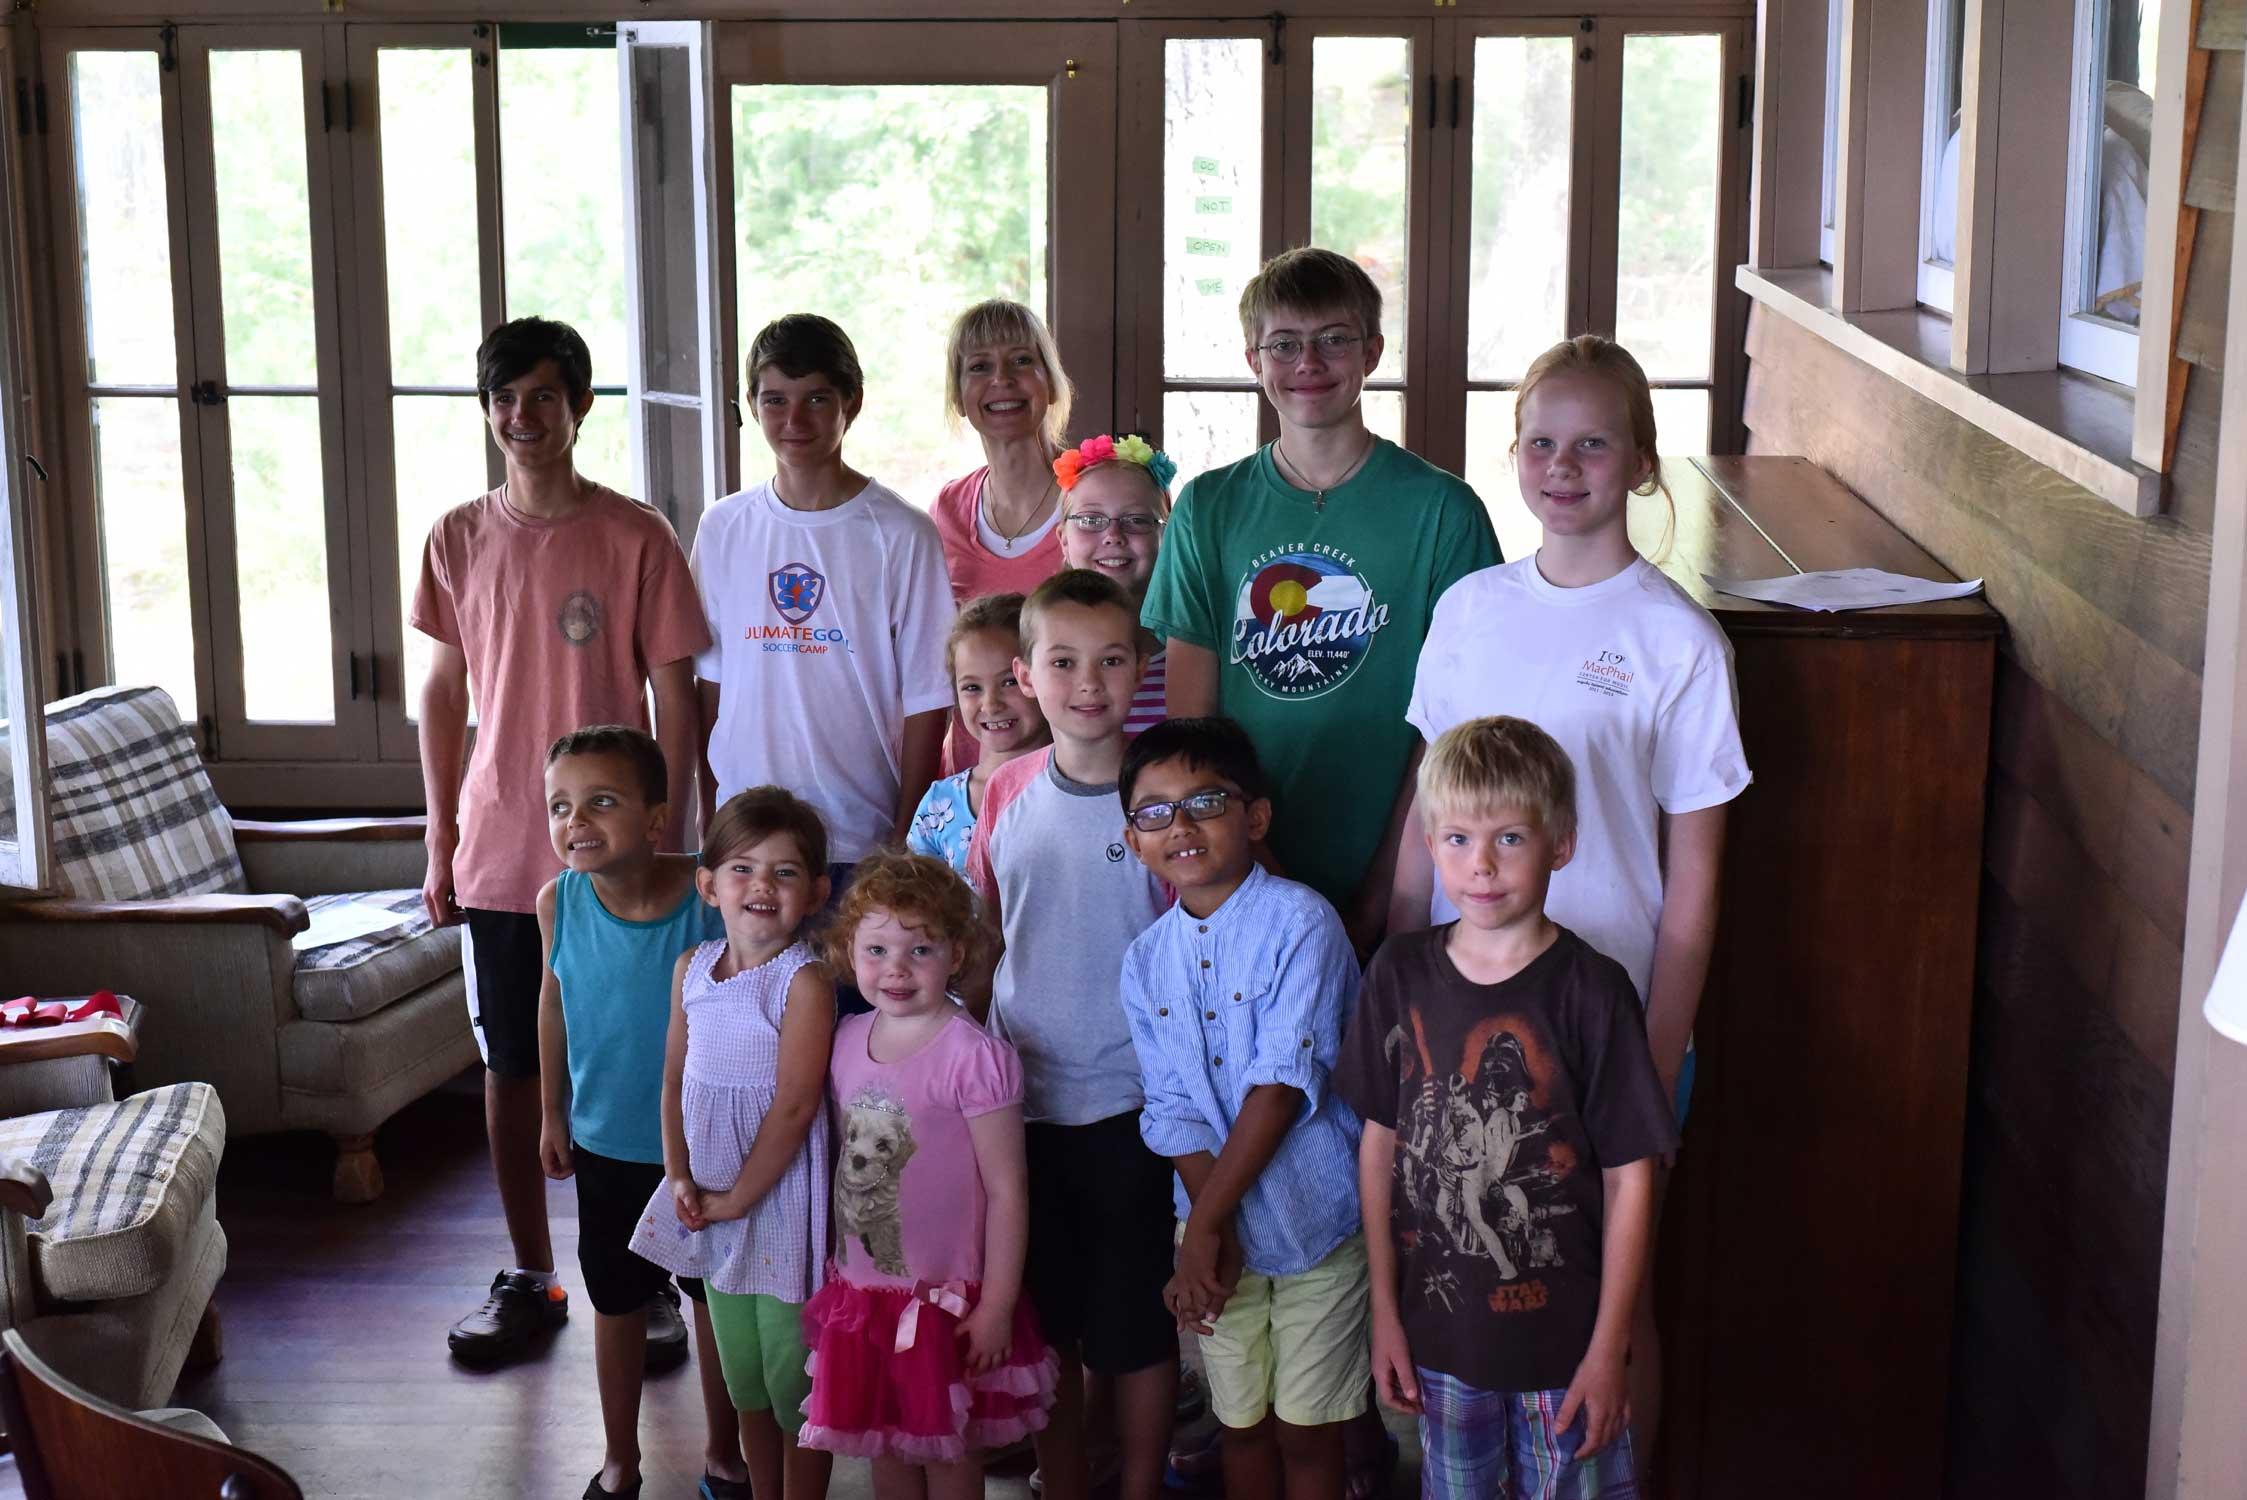 Little-Pines-Lodge-Recital-2016-.jpg